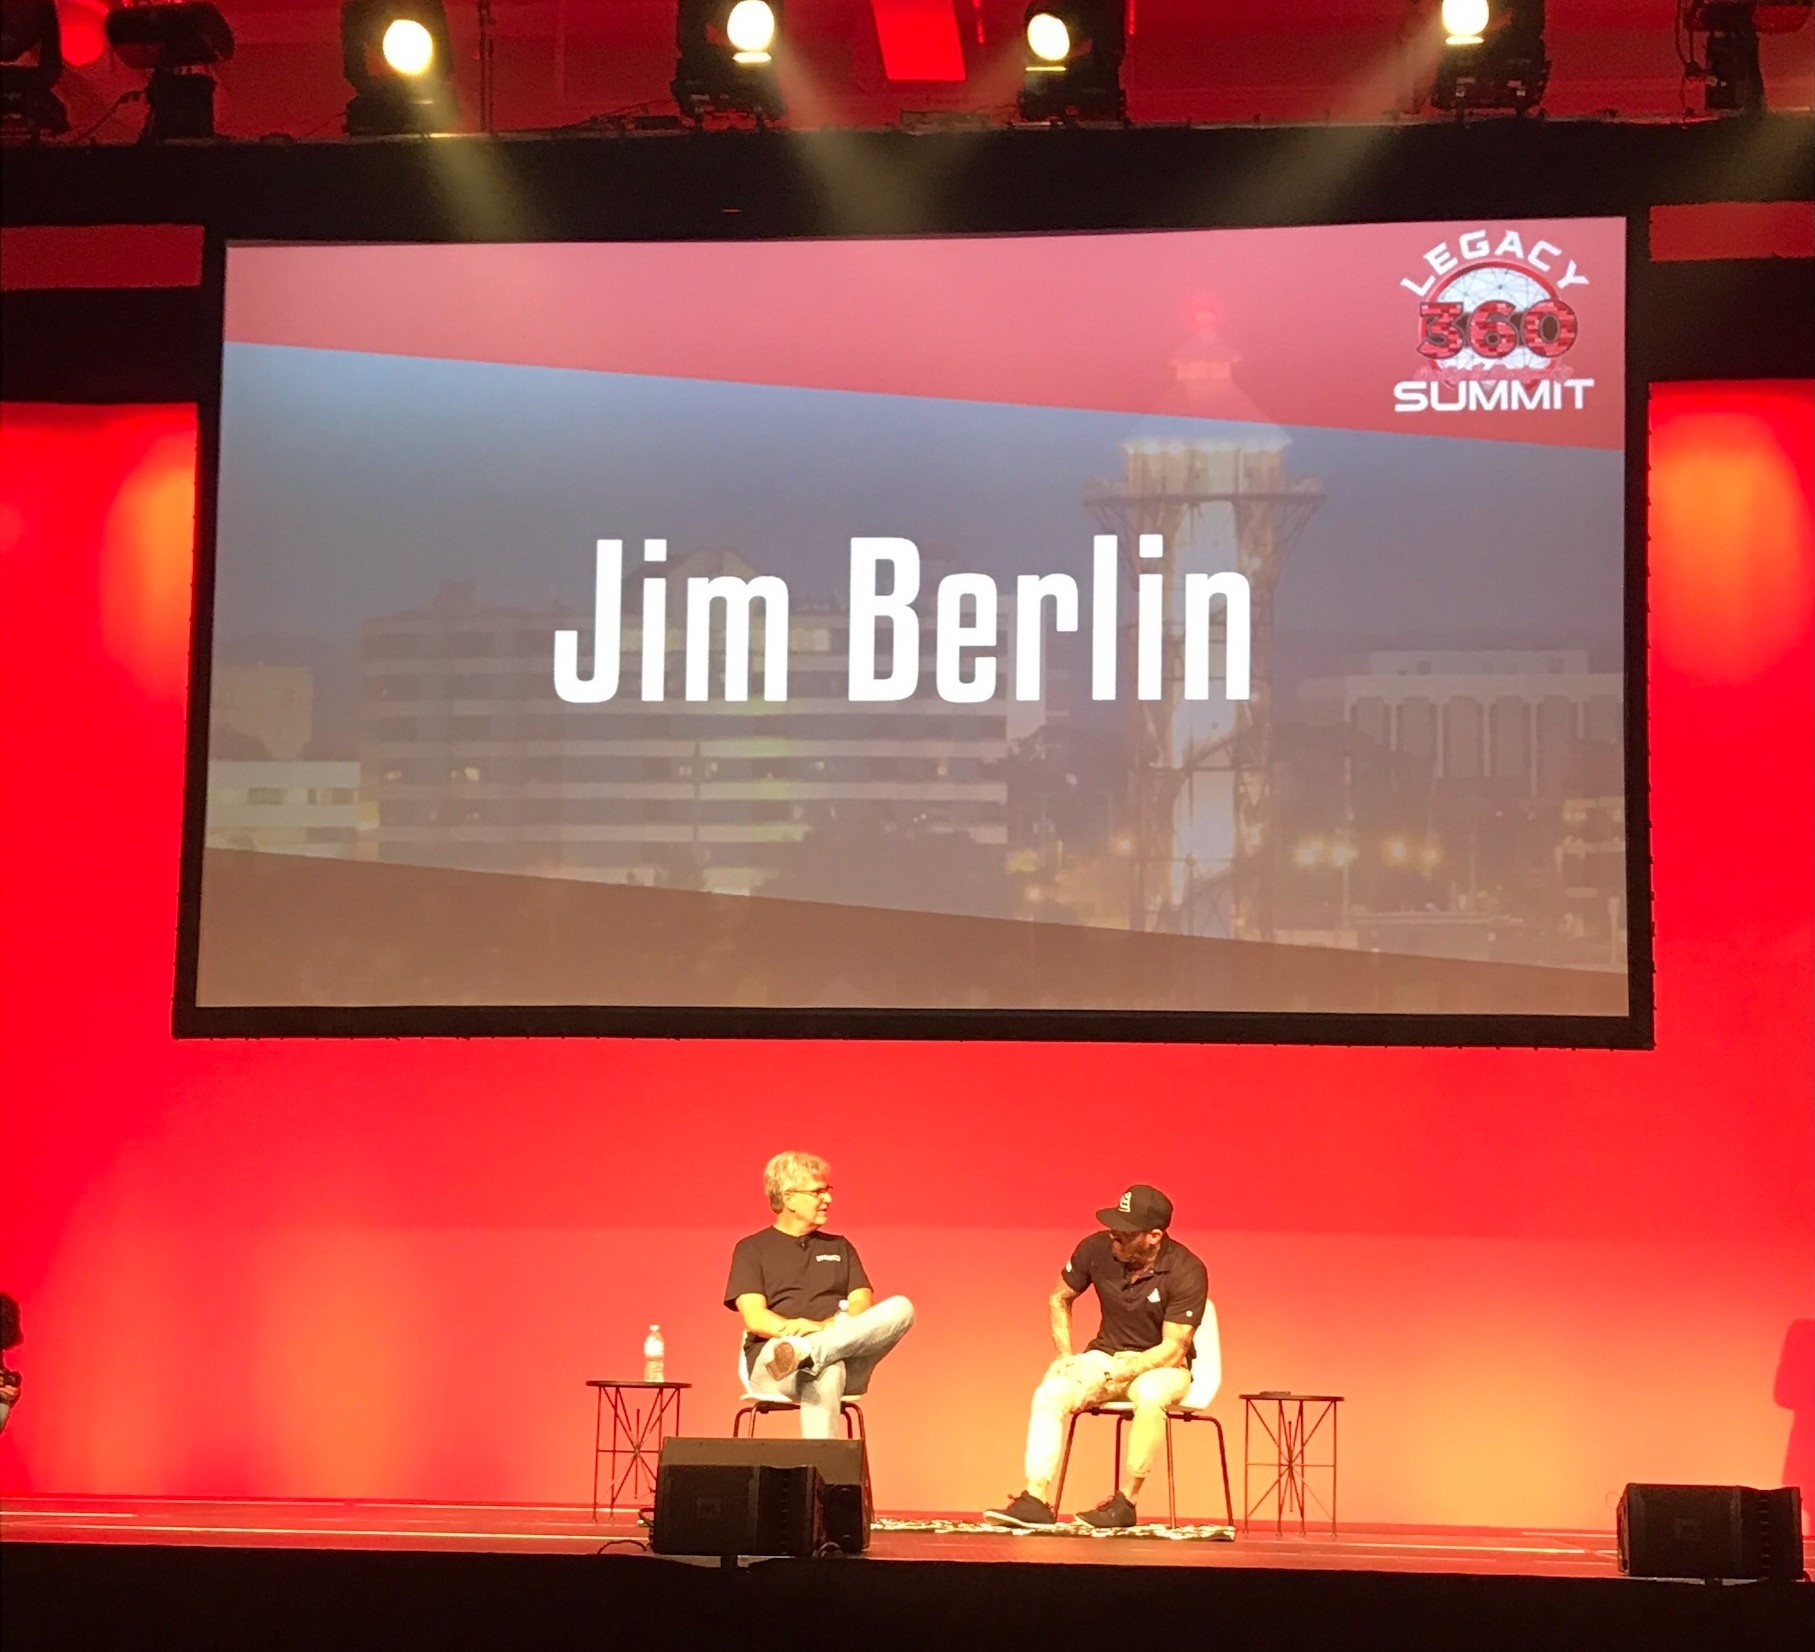 Jim Berlin Legacy 360 Summit